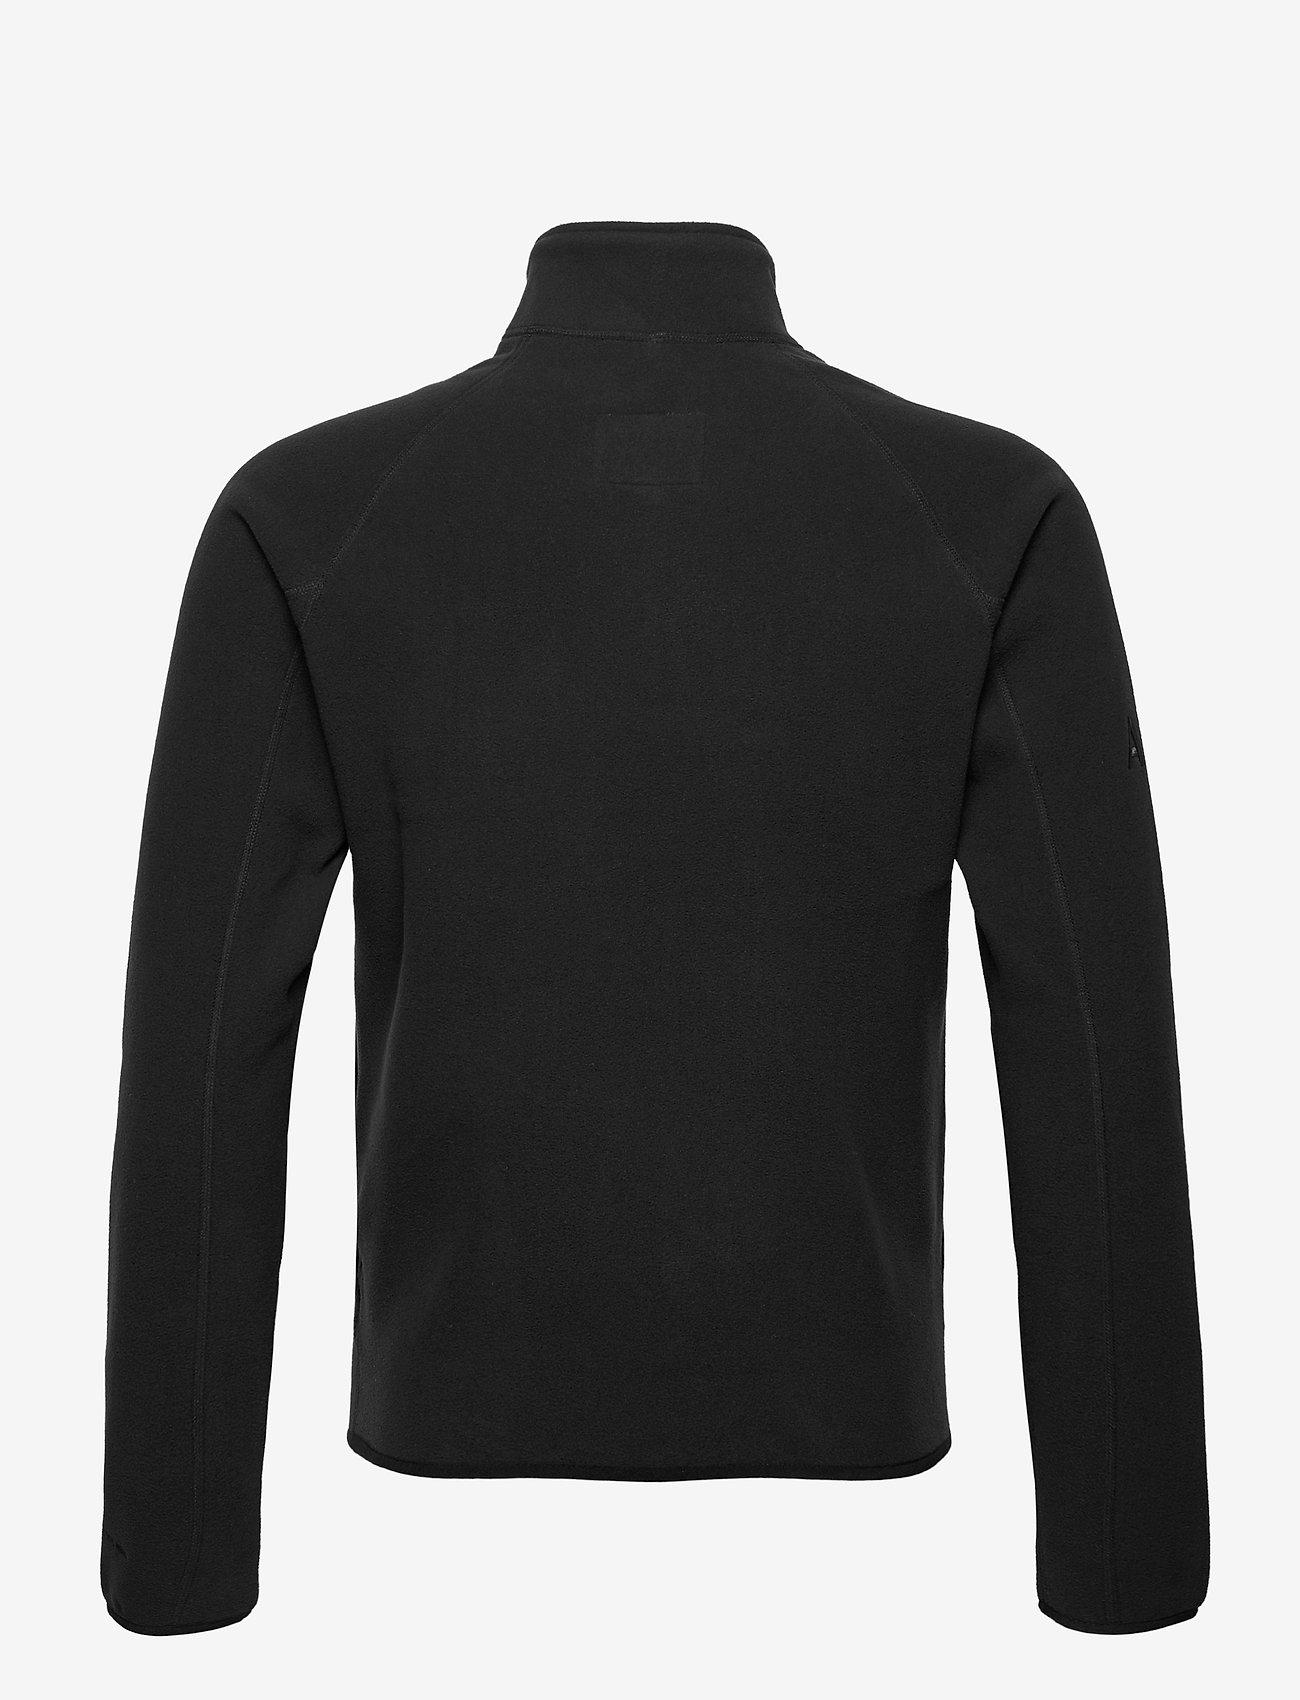 HALO - HALO ATW Zip Fleece - mid layer jackets - black - 1